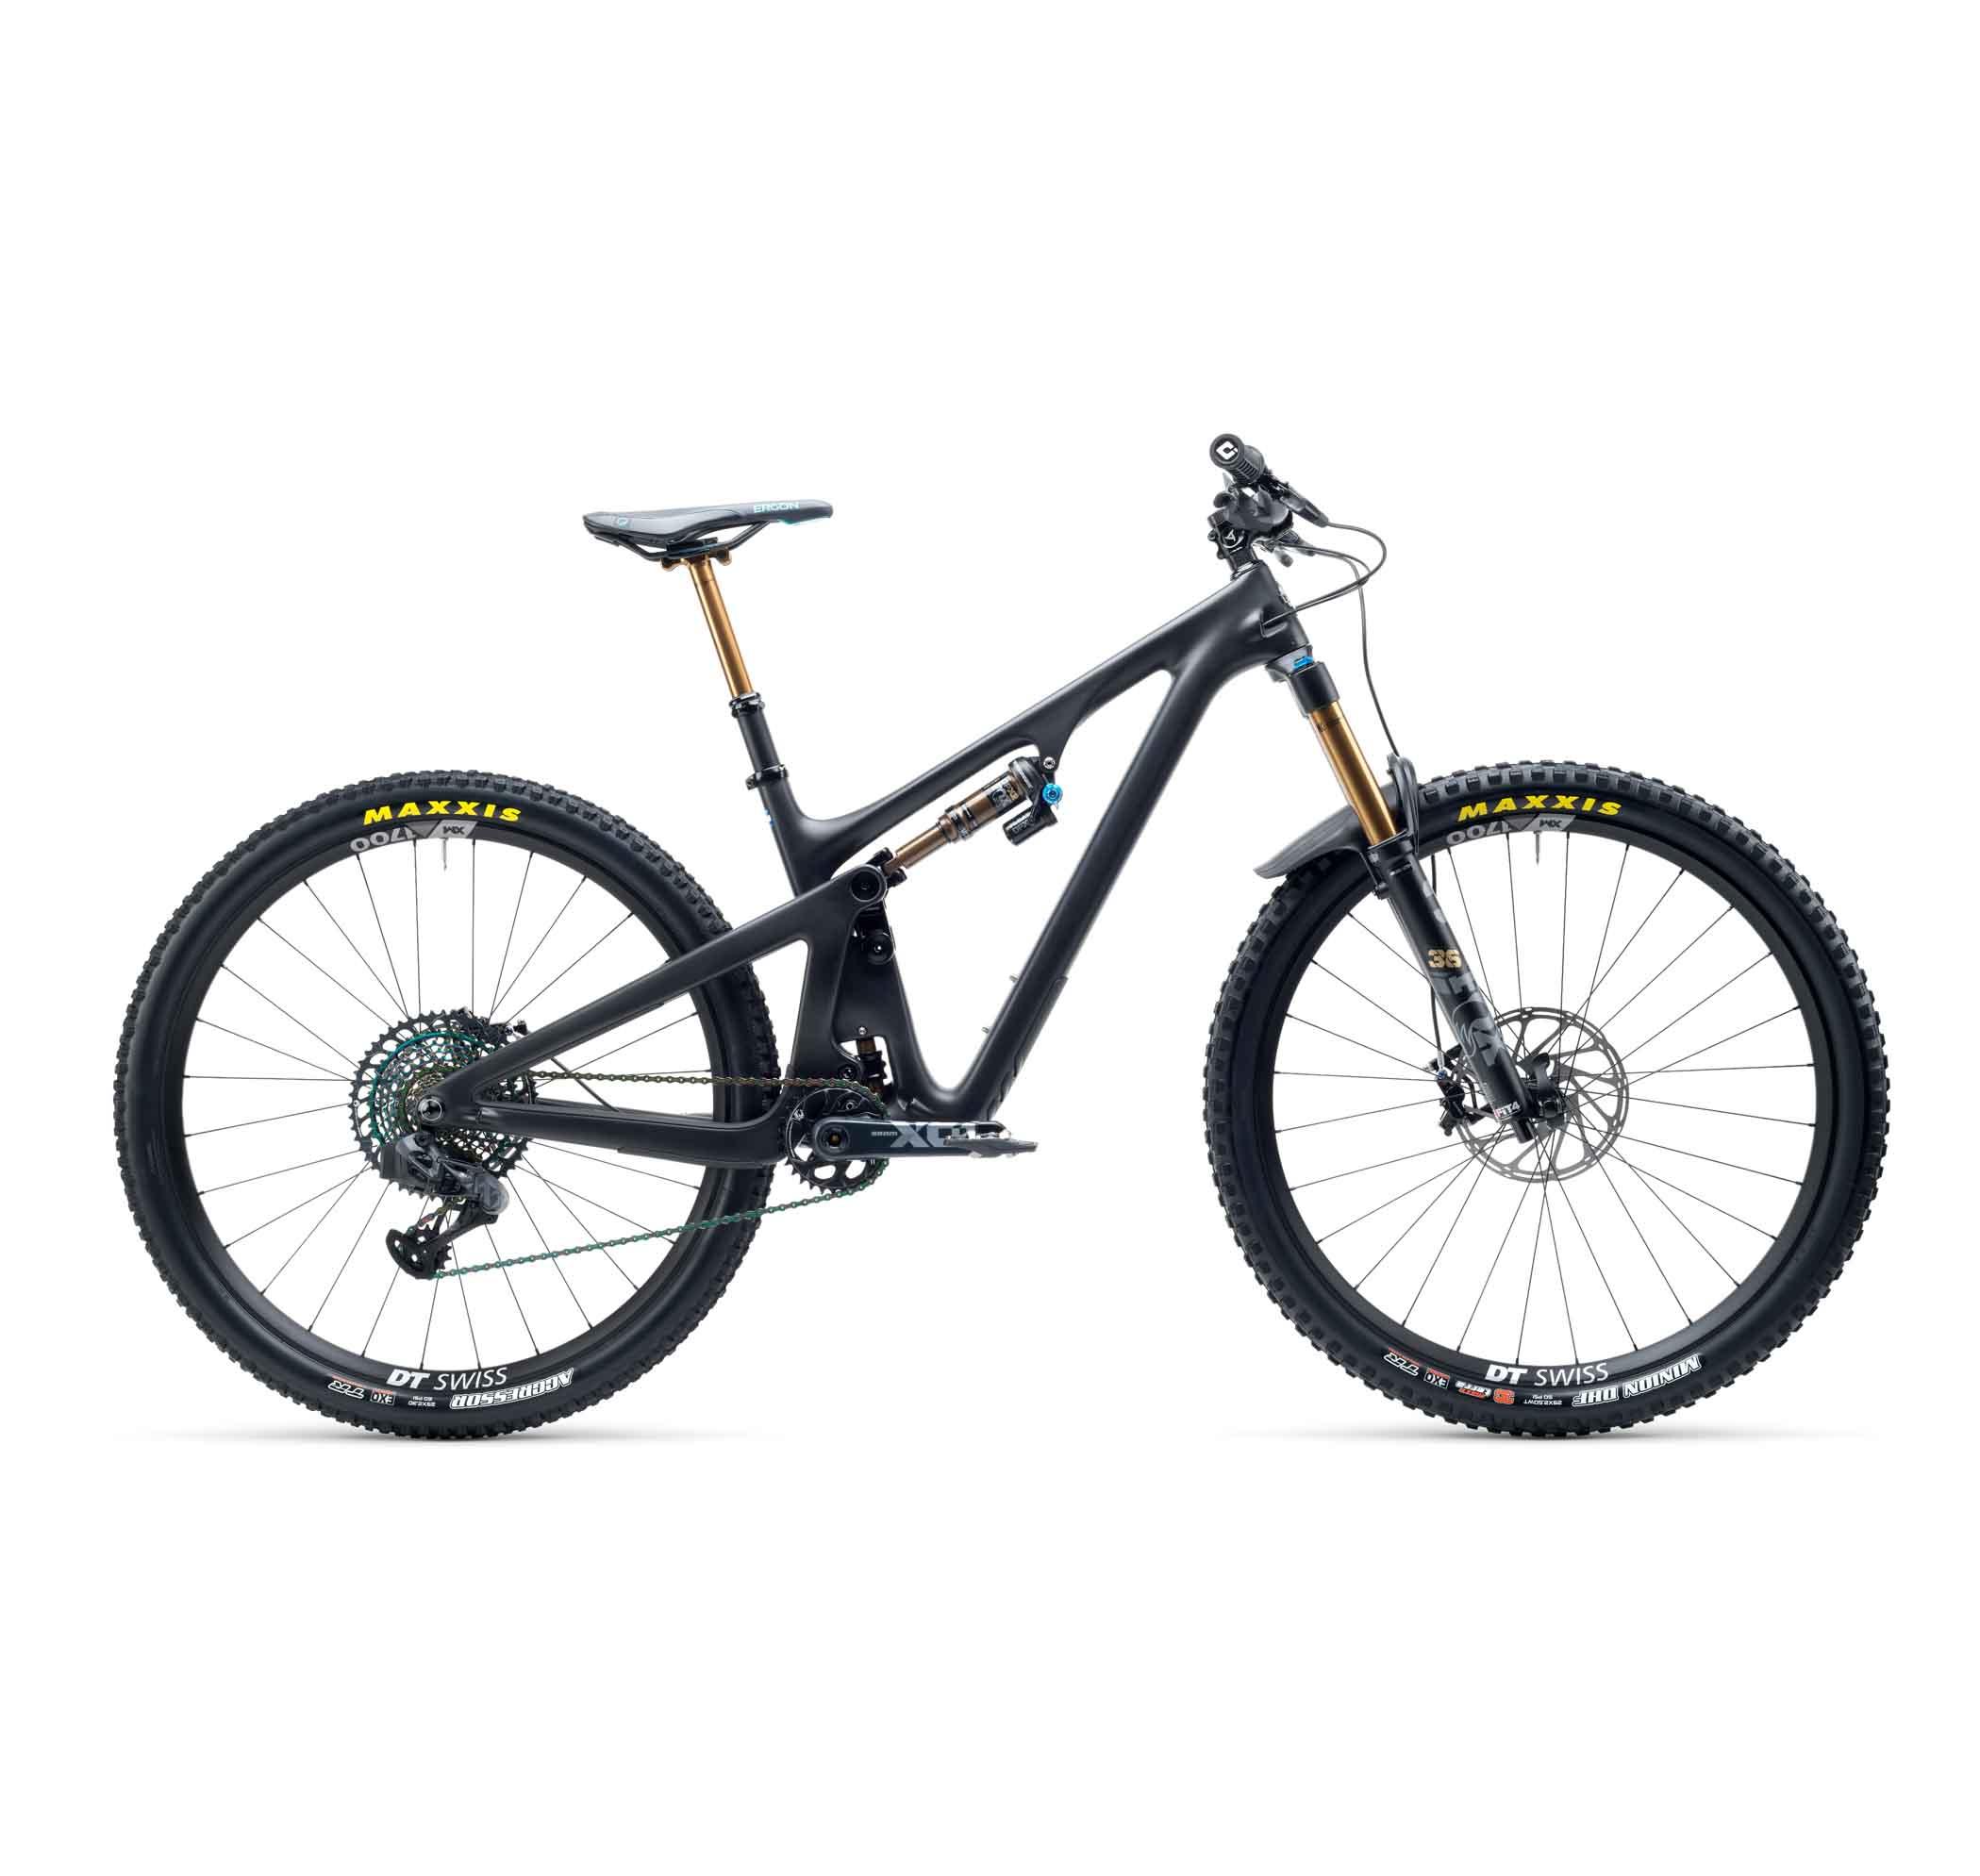 Yeti_Cycles_Rodeo_Bike_SB130_Black